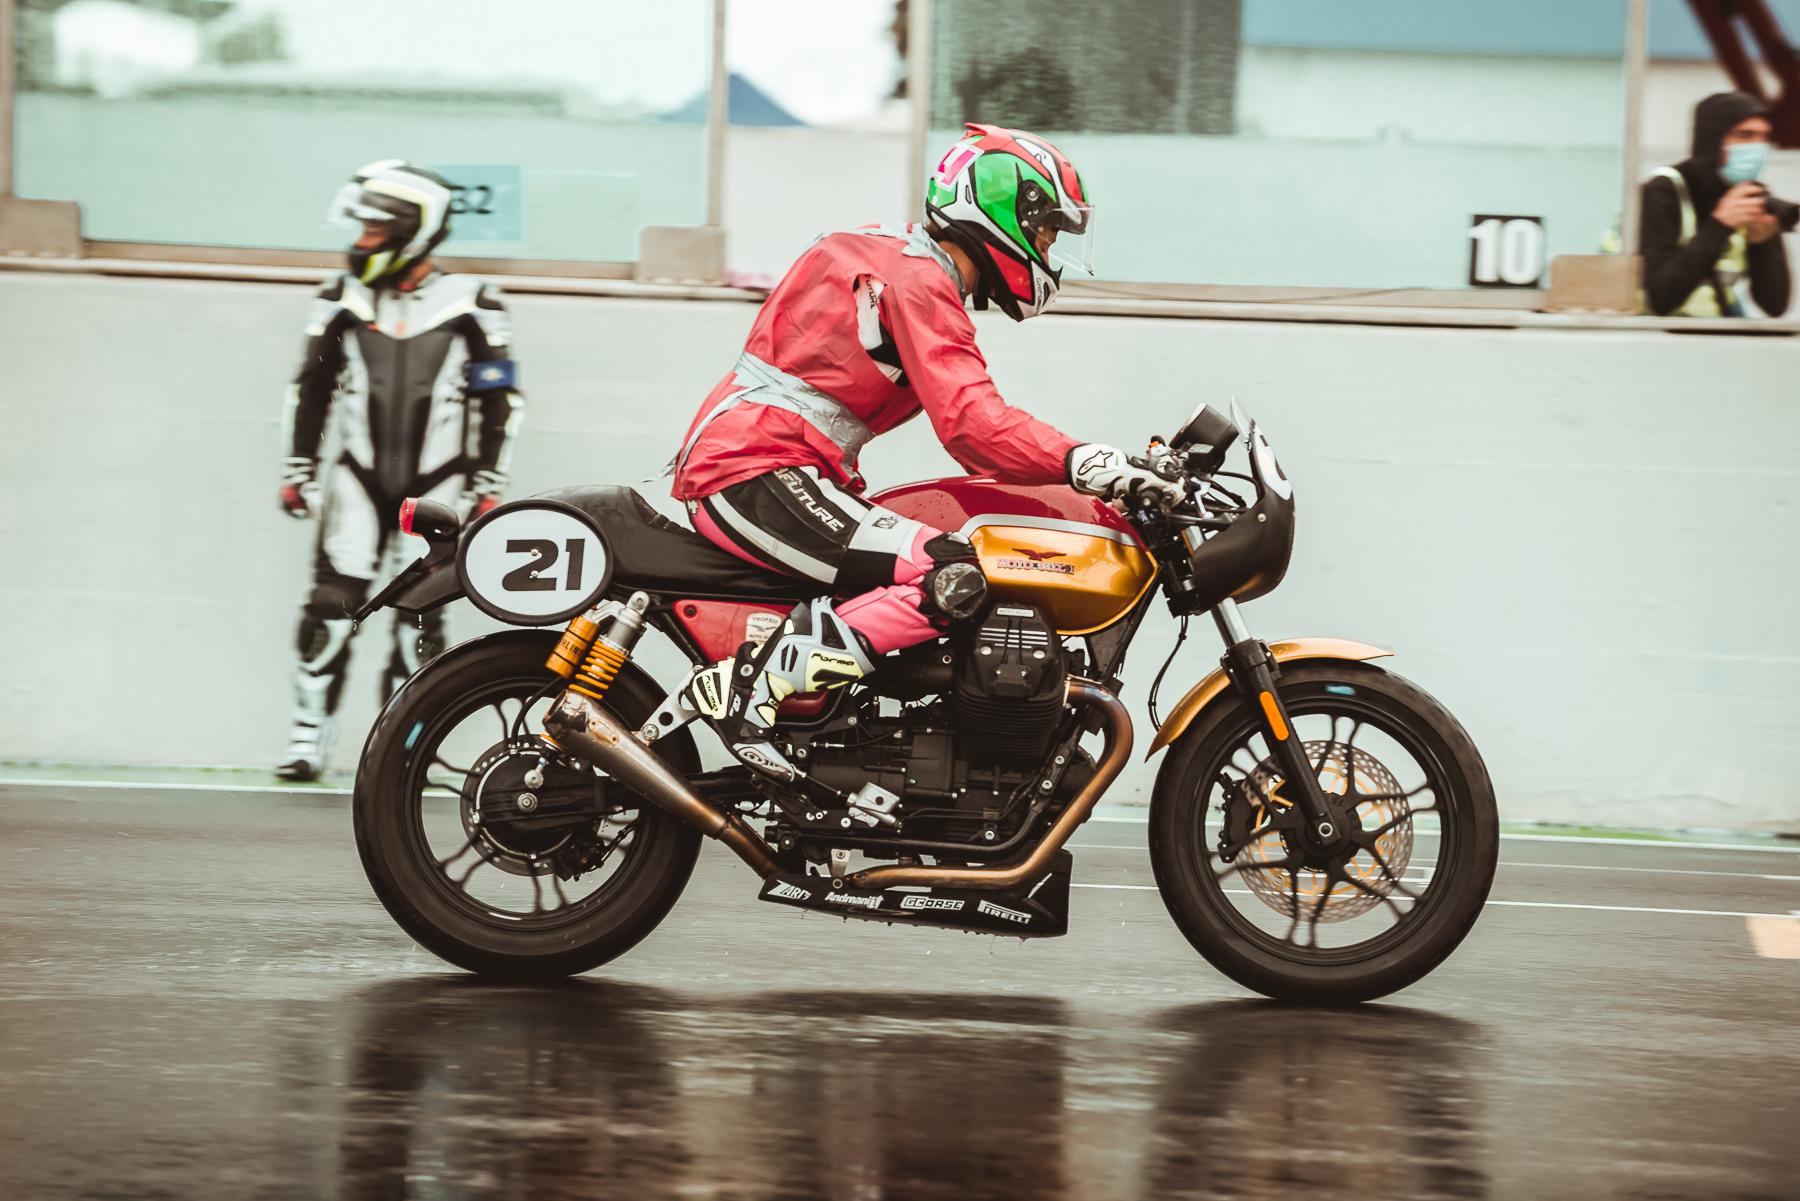 2020-Moto-Guzzi-Endurance-DAY-3-RAIN-28